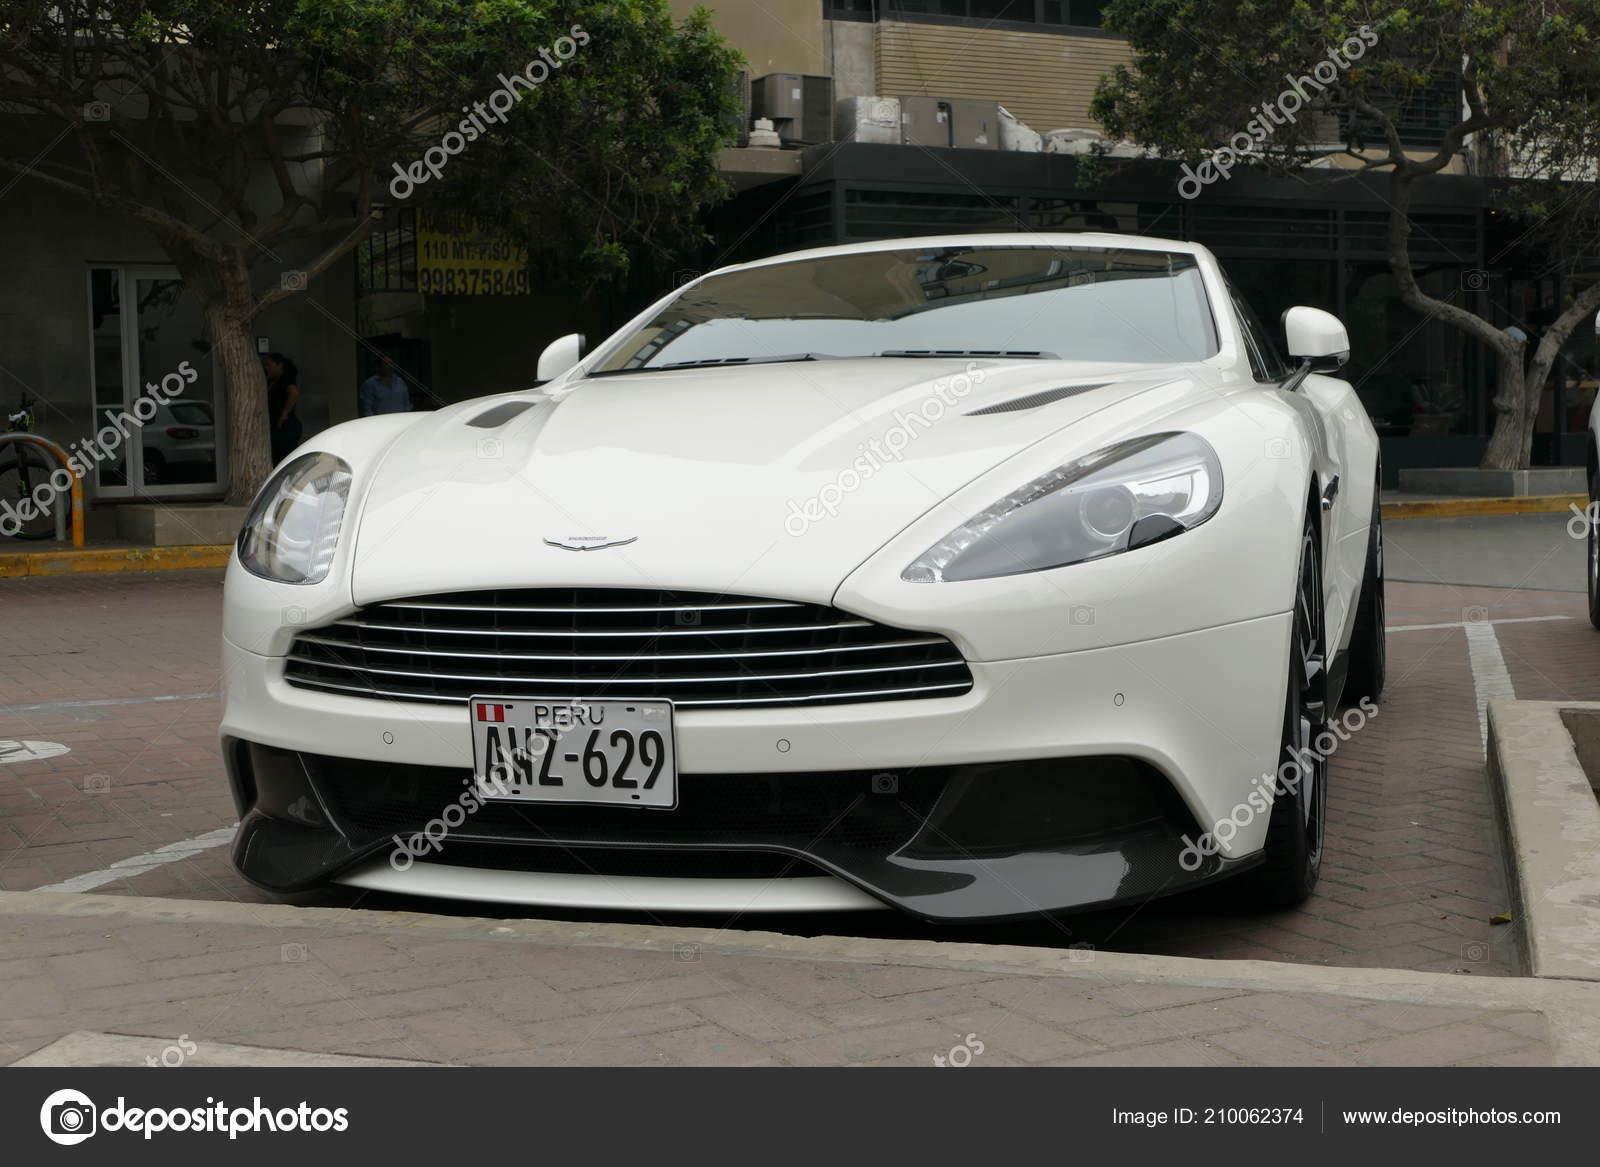 Lima Peru February 2018 Front View Mint Condition White Aston